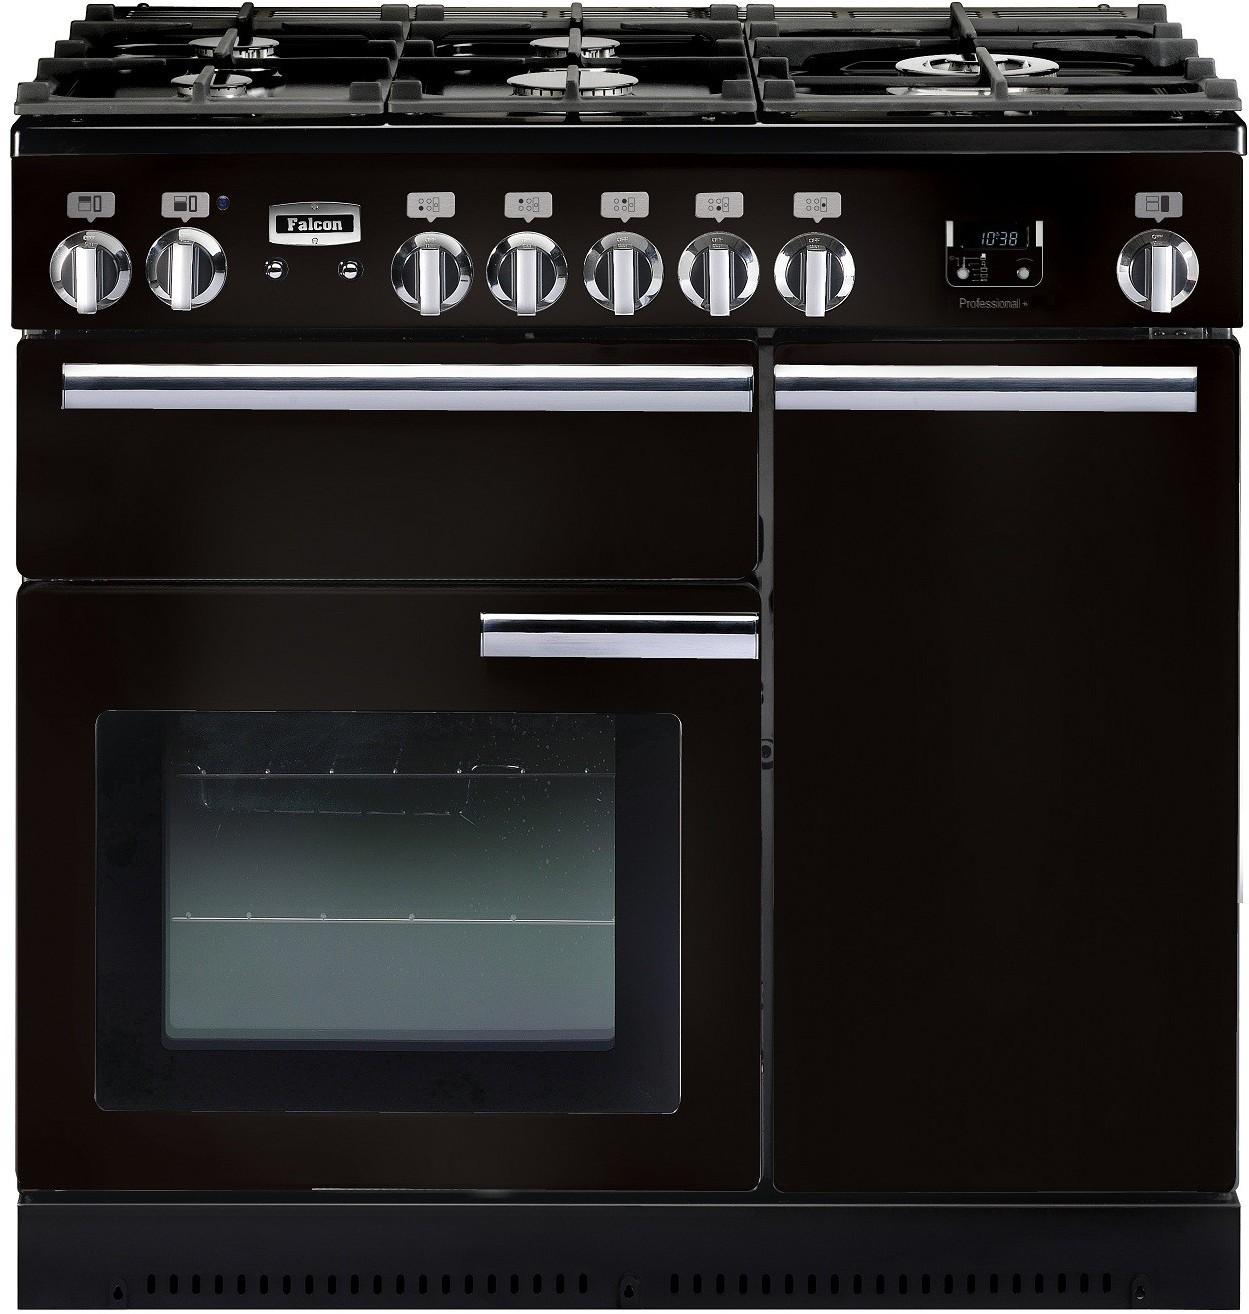 falcon professional plus 90 gas elektro fornuis. Black Bedroom Furniture Sets. Home Design Ideas